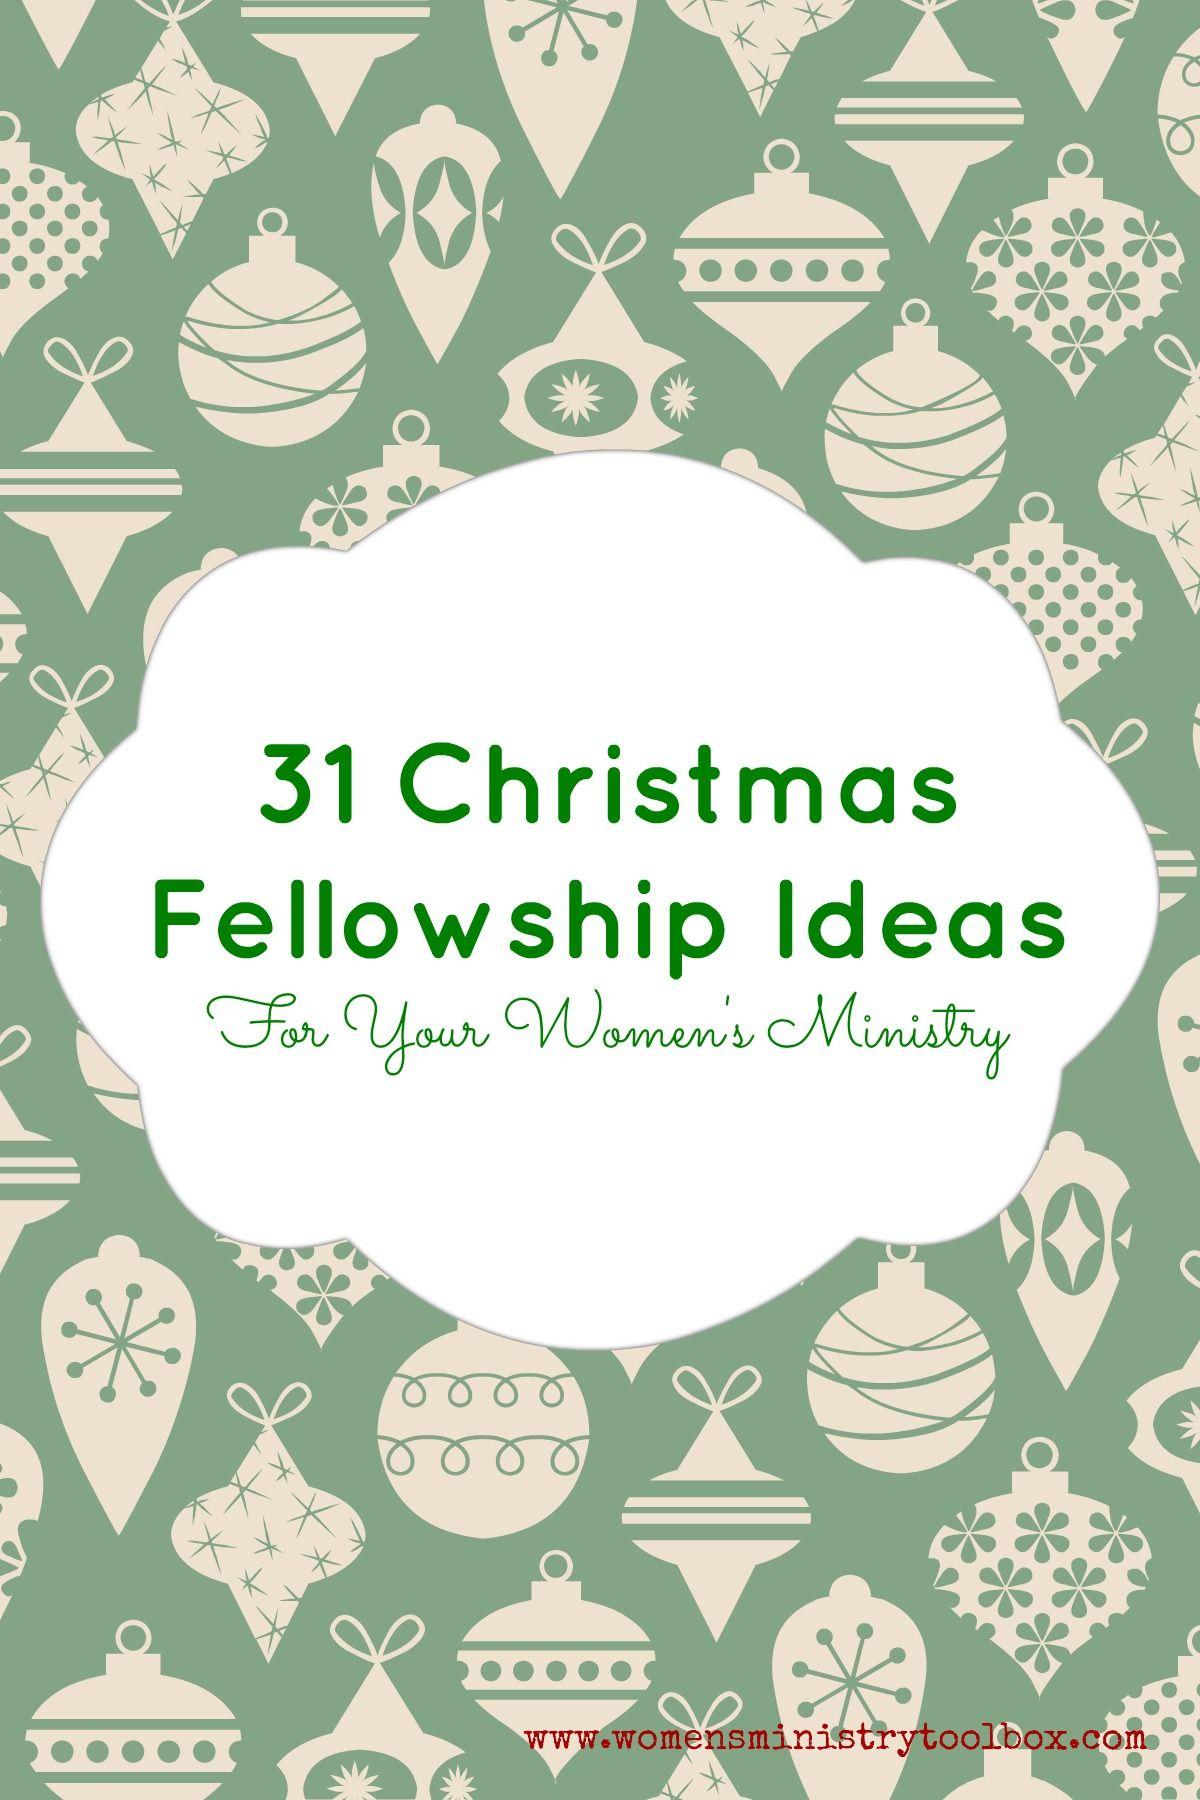 31 Christmas Fellowship Ideas Christian women's ministry